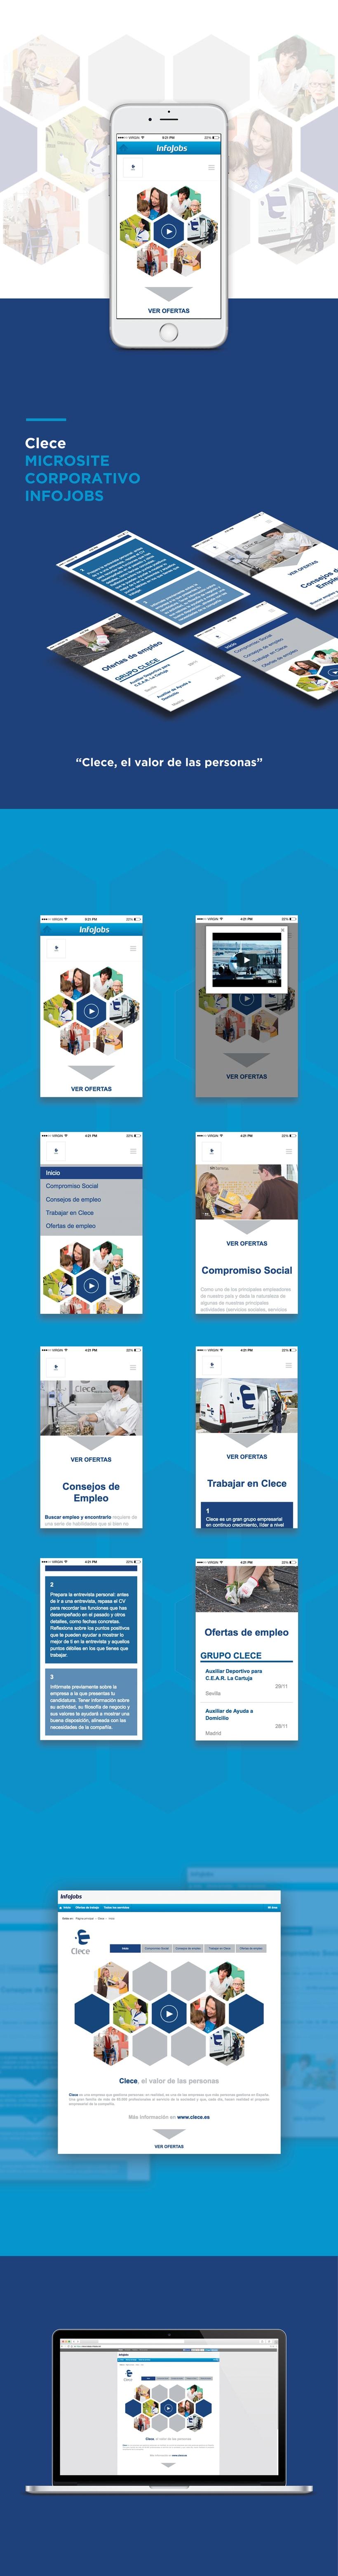 Microsite corporativa Infojobs para CLECE (GRUPO ACS) 2